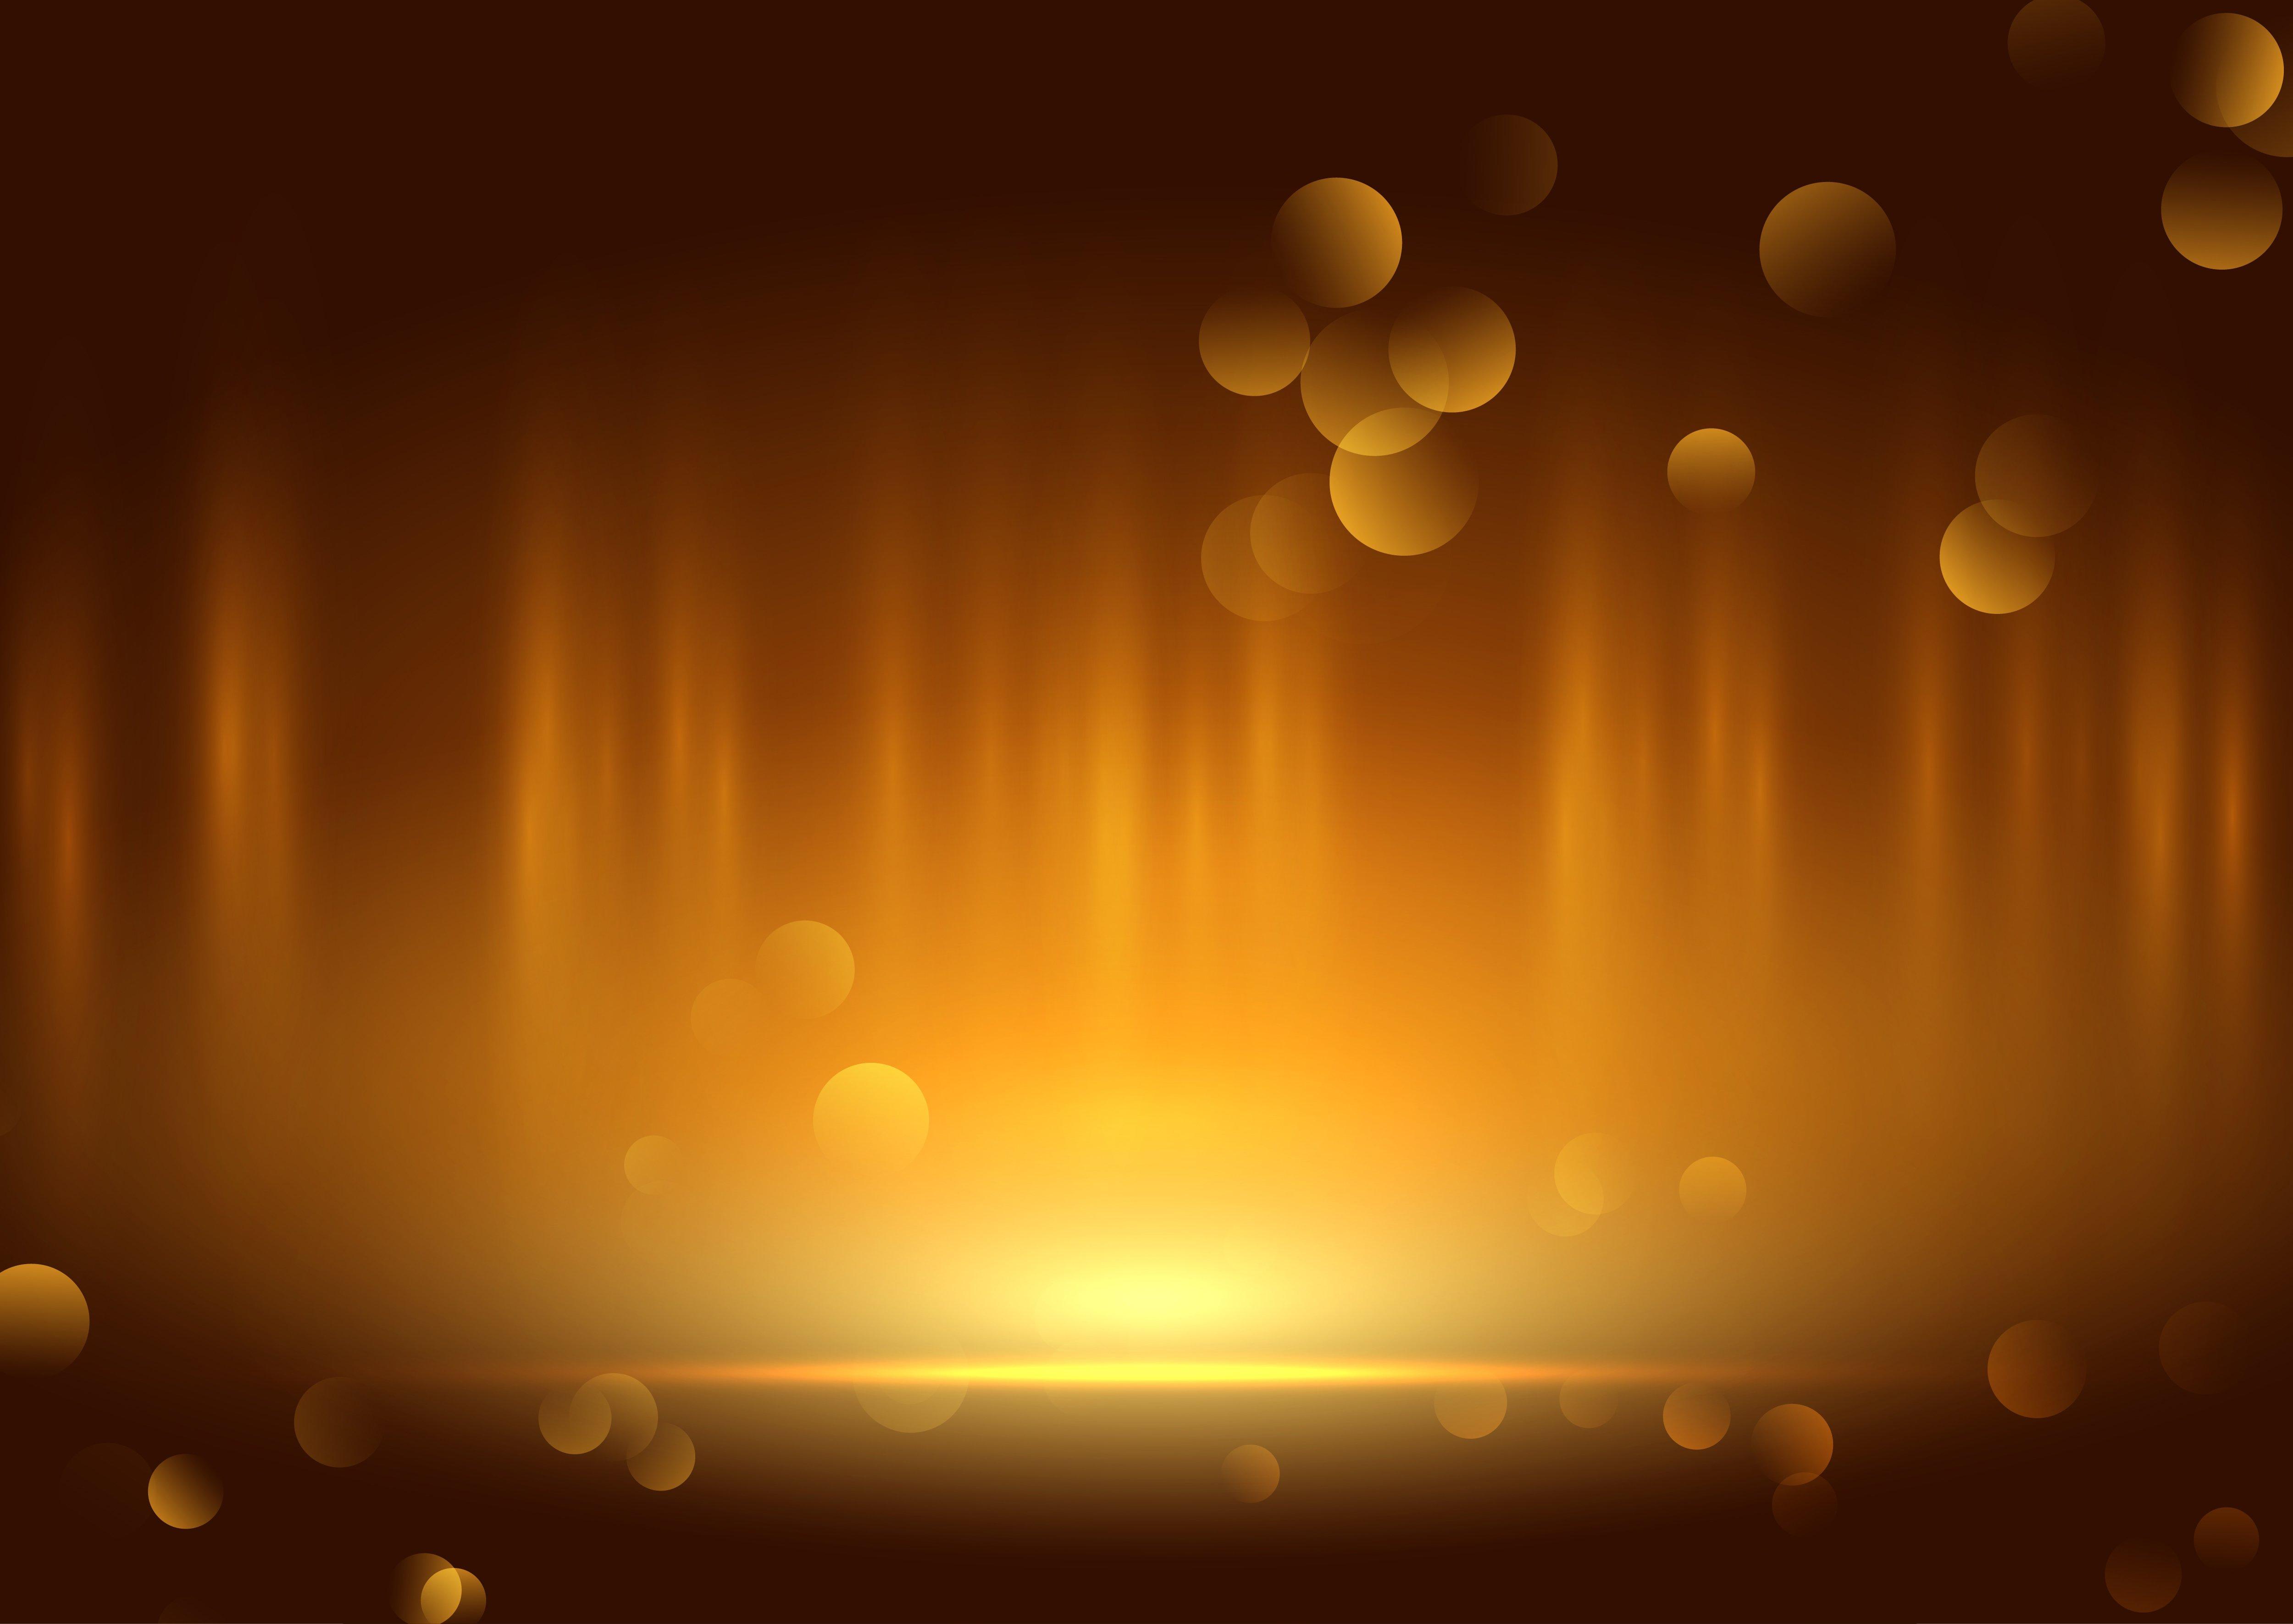 Display background with golden lights 678938 Vector Art at Vecteezy 5000x3542